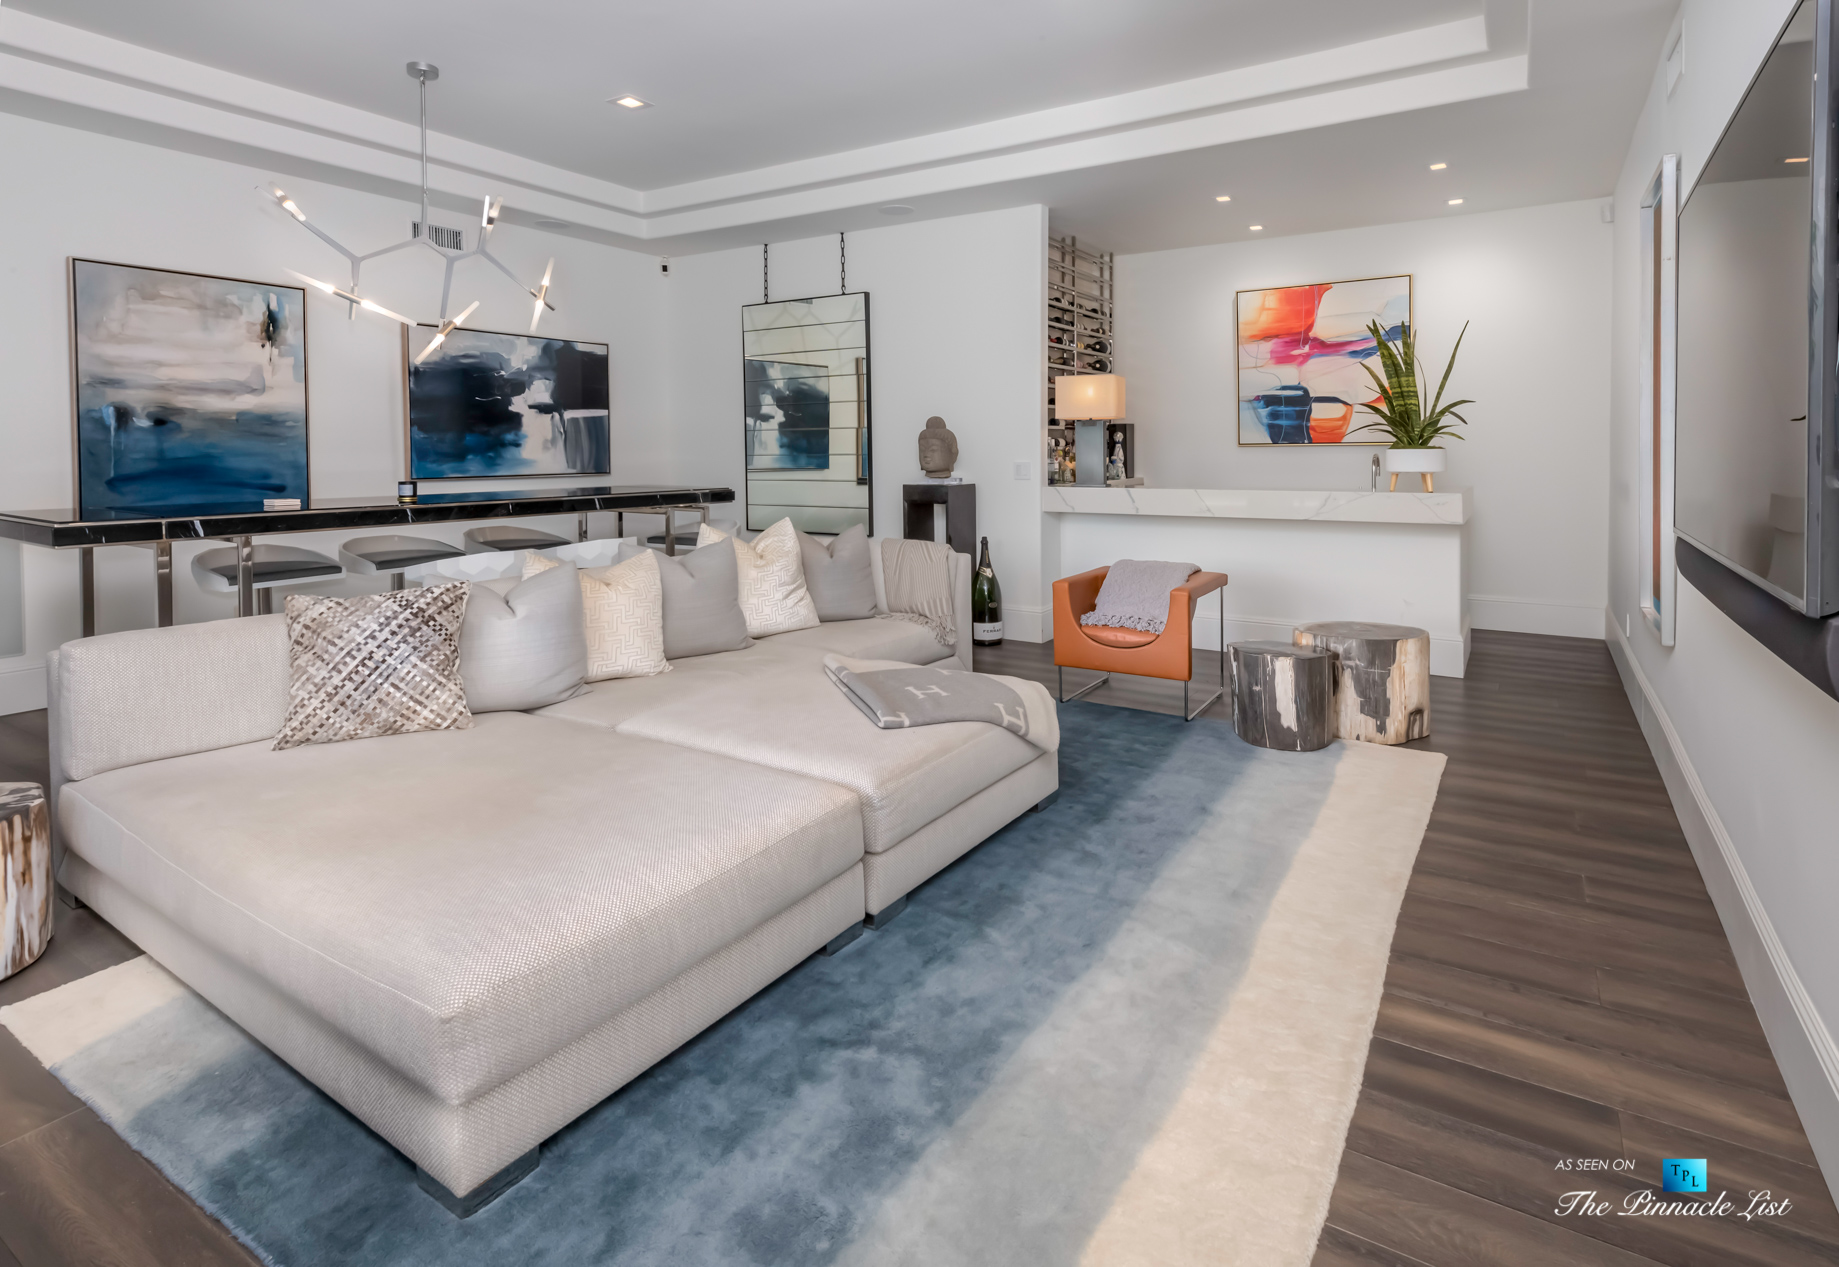 2720 Ellison Dr, Beverly Hills, CA, USA – Recreation Room and Bar – Luxury Real Estate – Italian Villa Hilltop Home